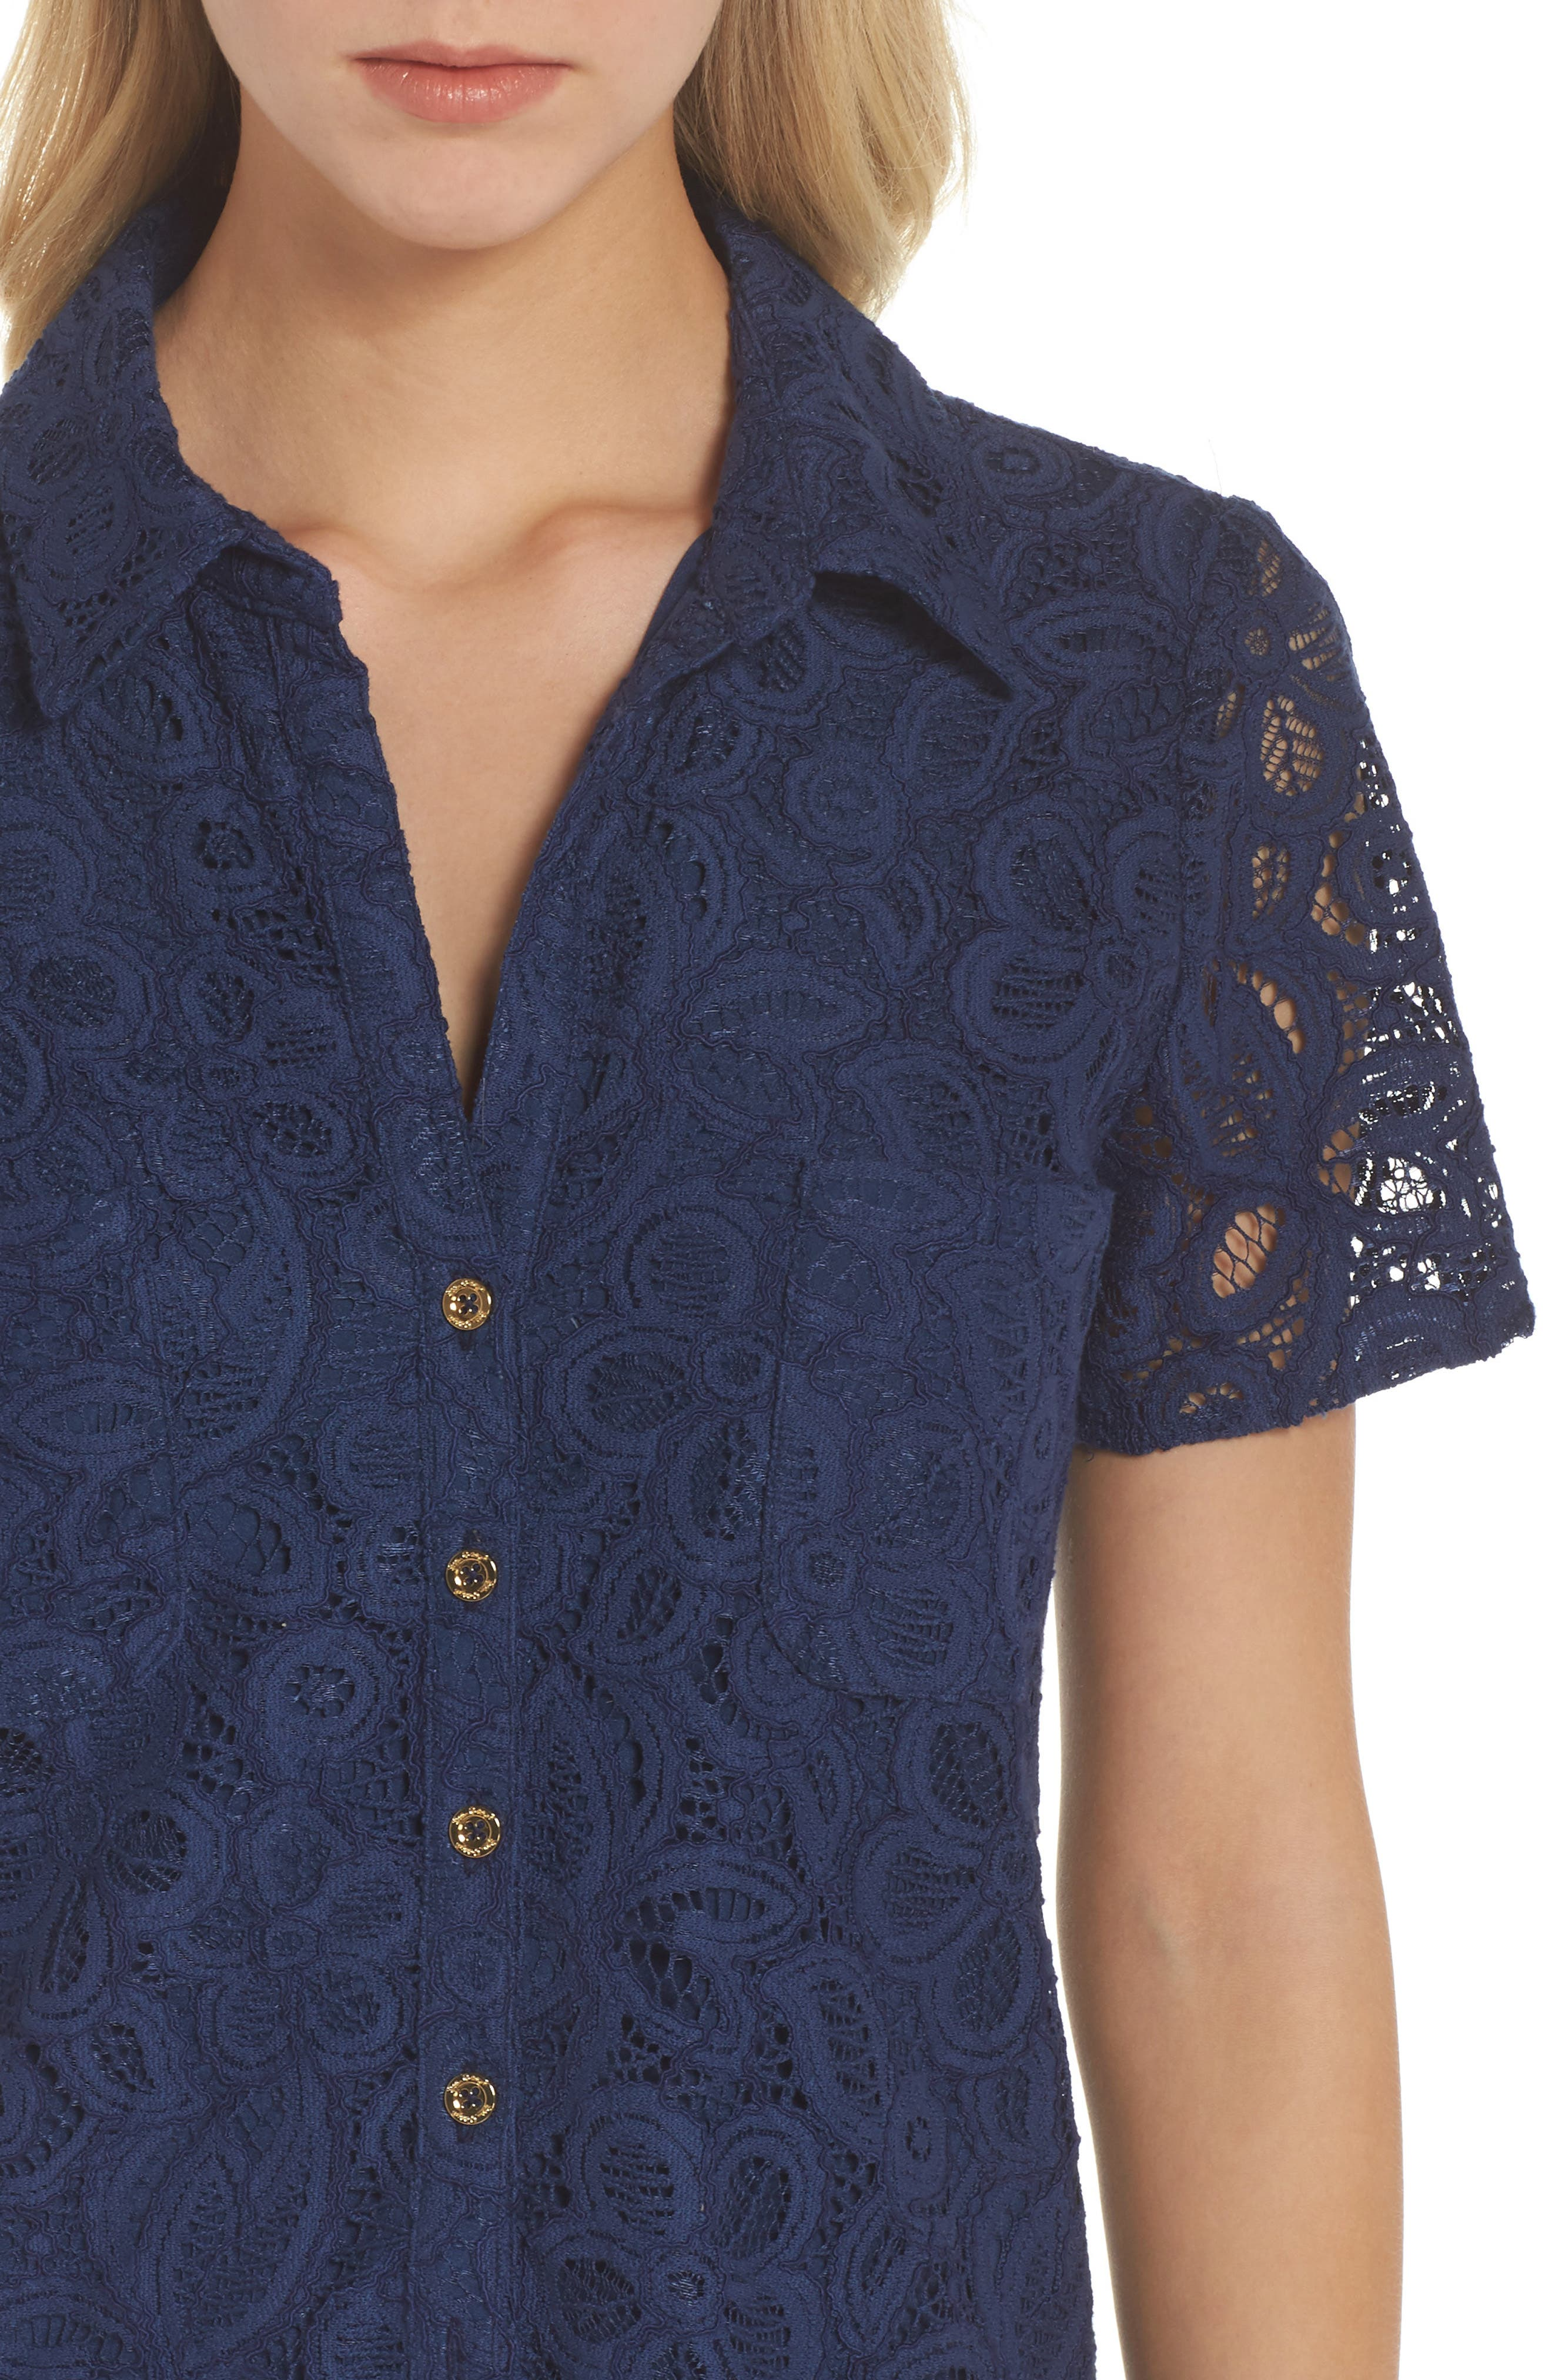 Nelle Shirtdress,                             Alternate thumbnail 4, color,                             High Tide Floral Pop Lace